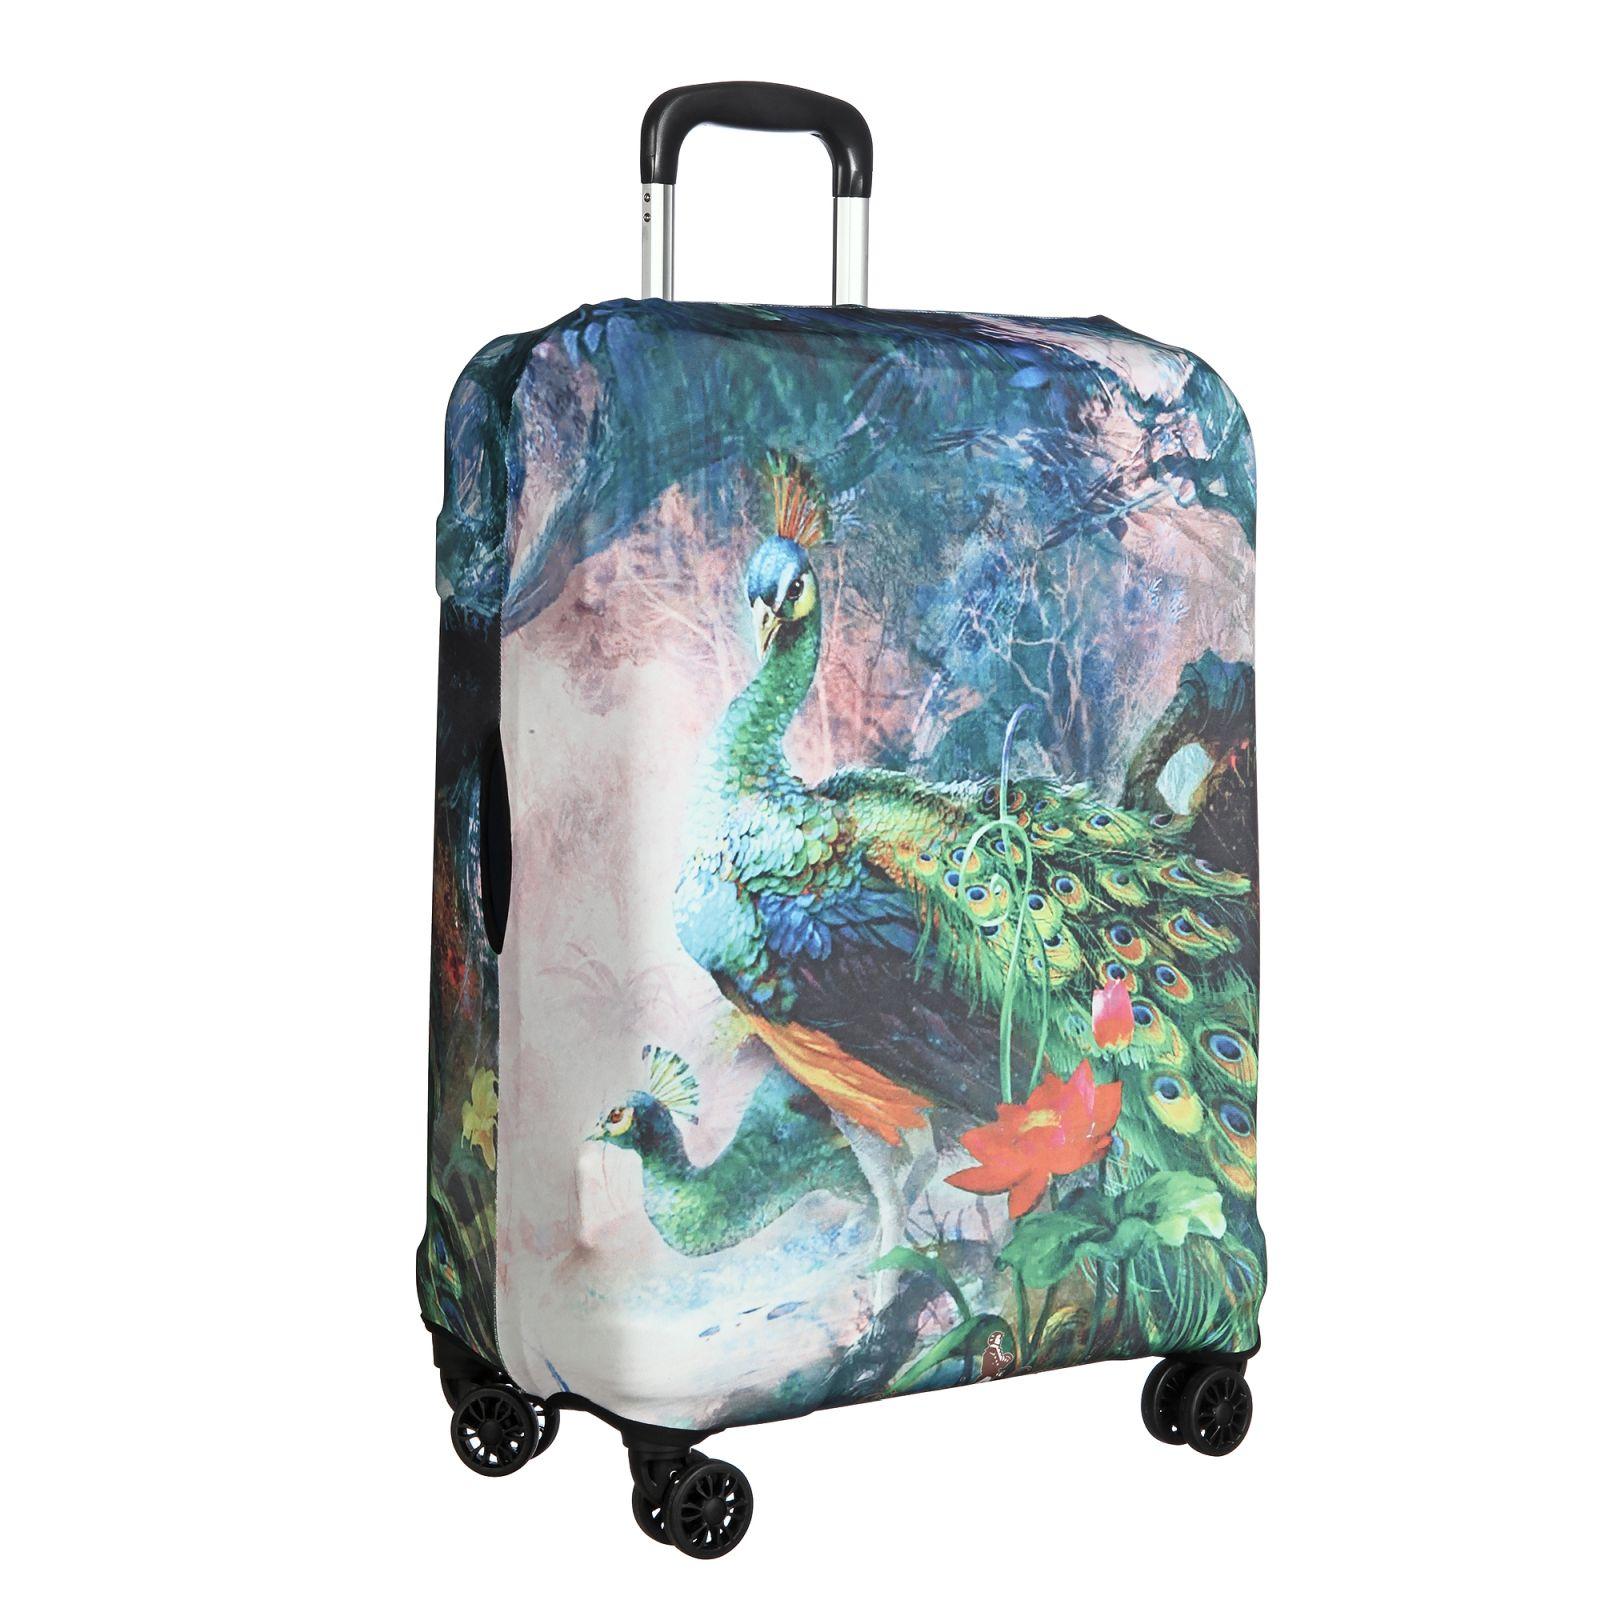 Защитное покрытие для чемодана Gianni Conti 9051 M.